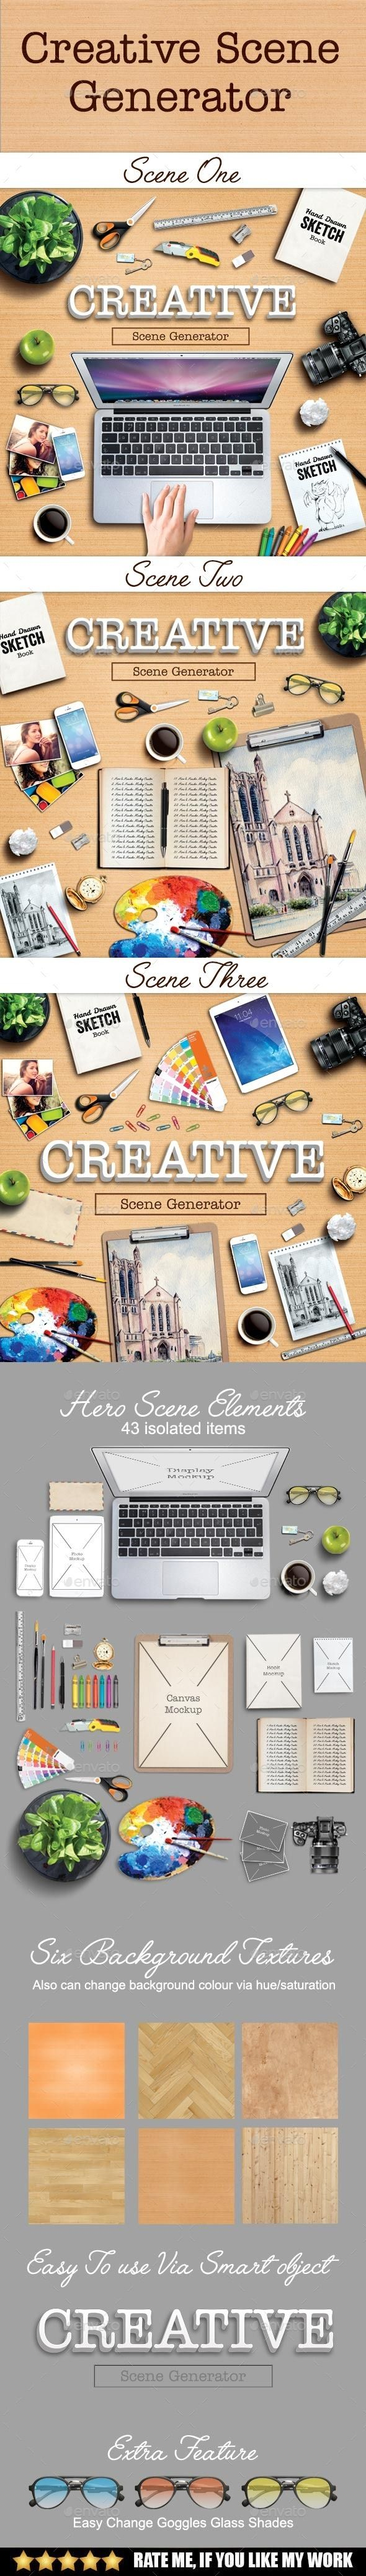 Creative scene generator #design Download: http://graphicriver.net/item/creative-scene-generator/11856223?ref=ksioks